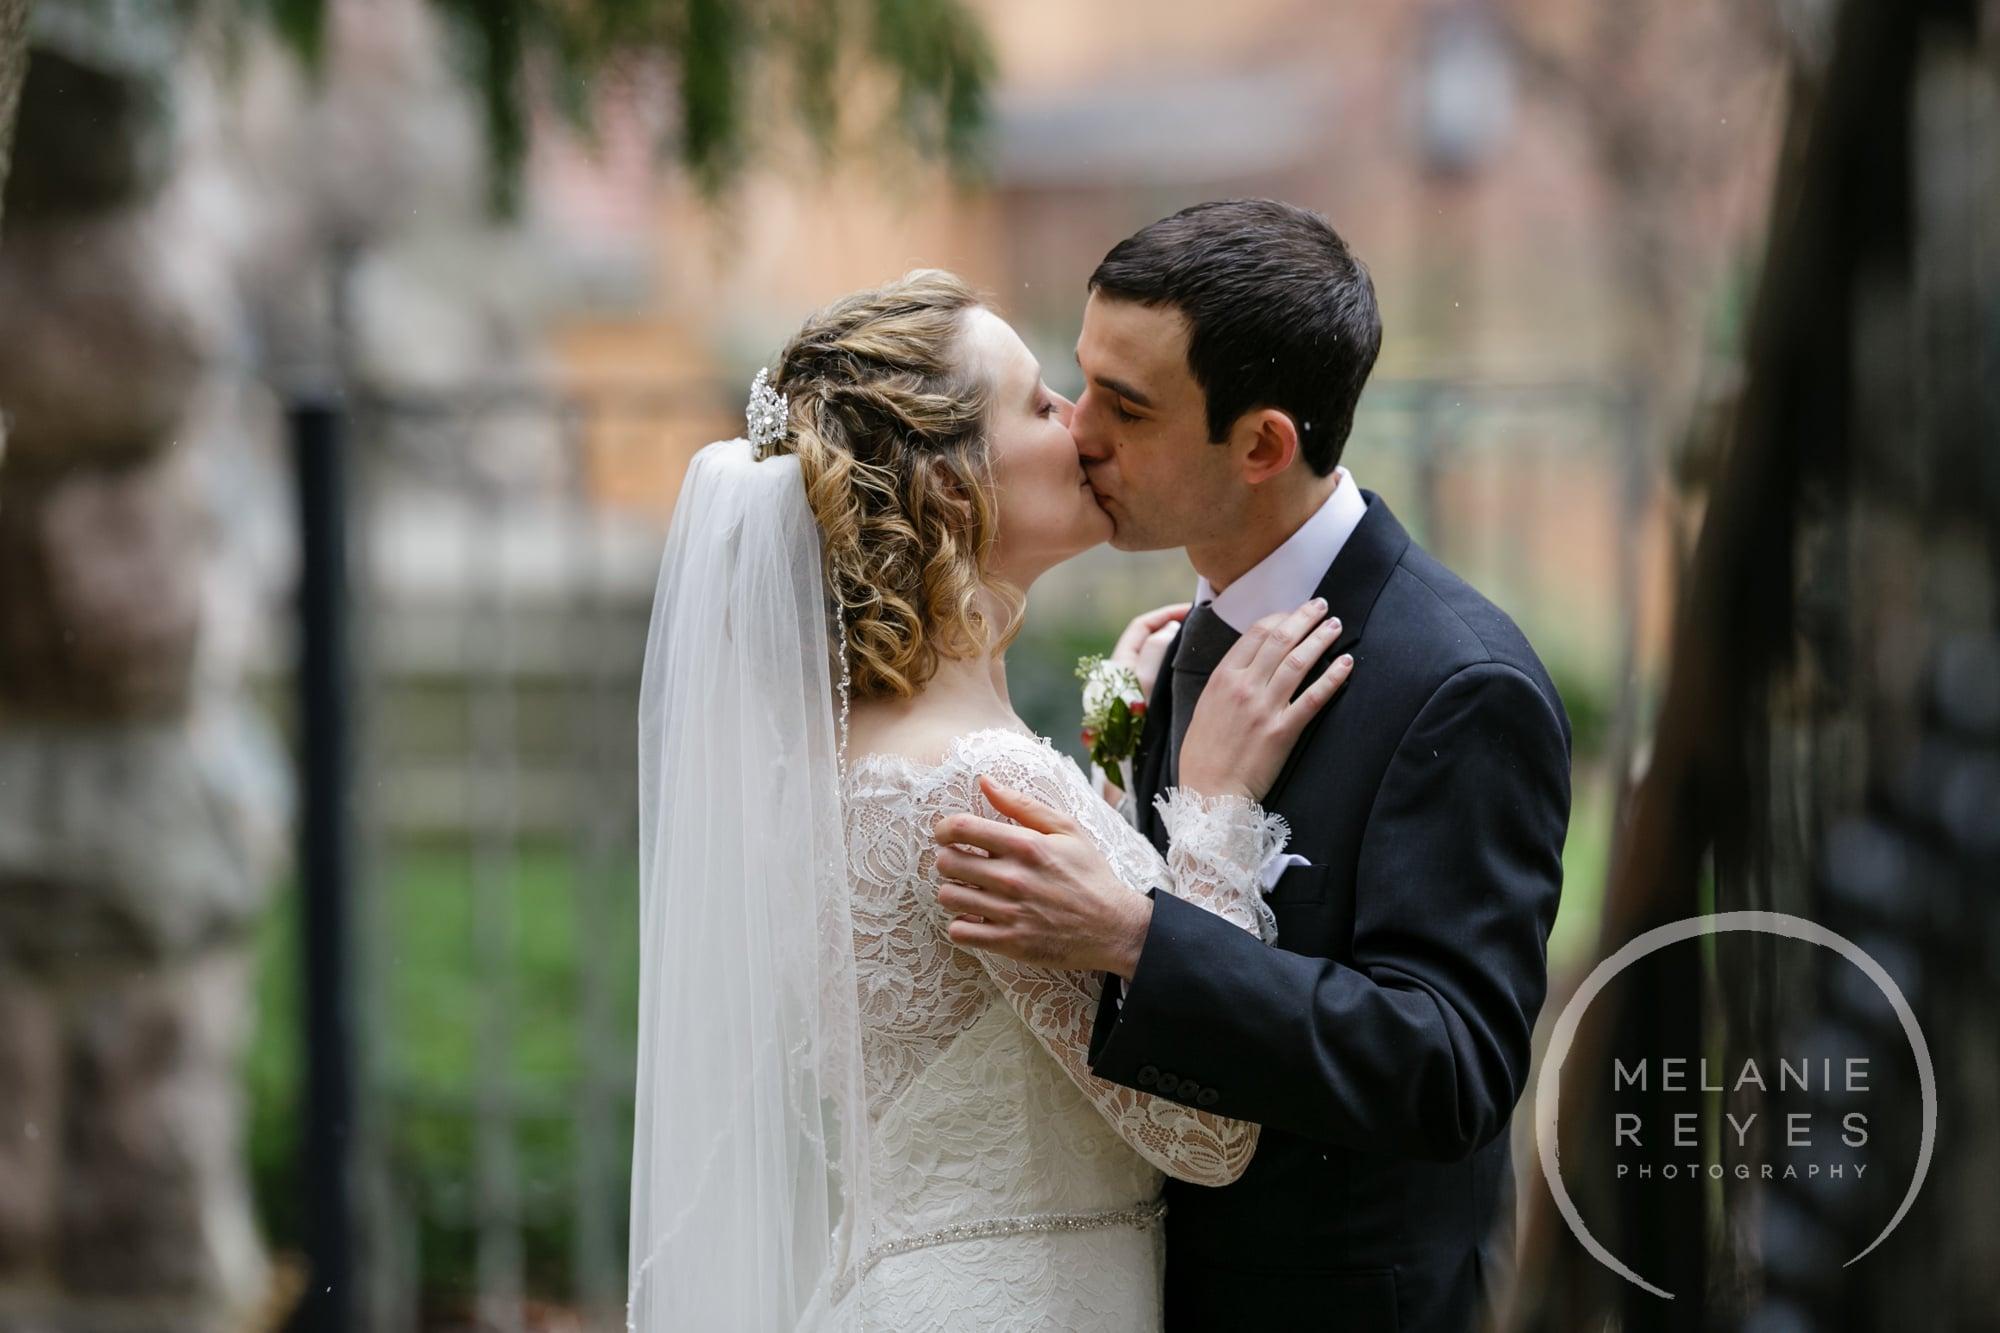 2015_ann_arbor_wedding_photographer_melaniereyes_020.JPG